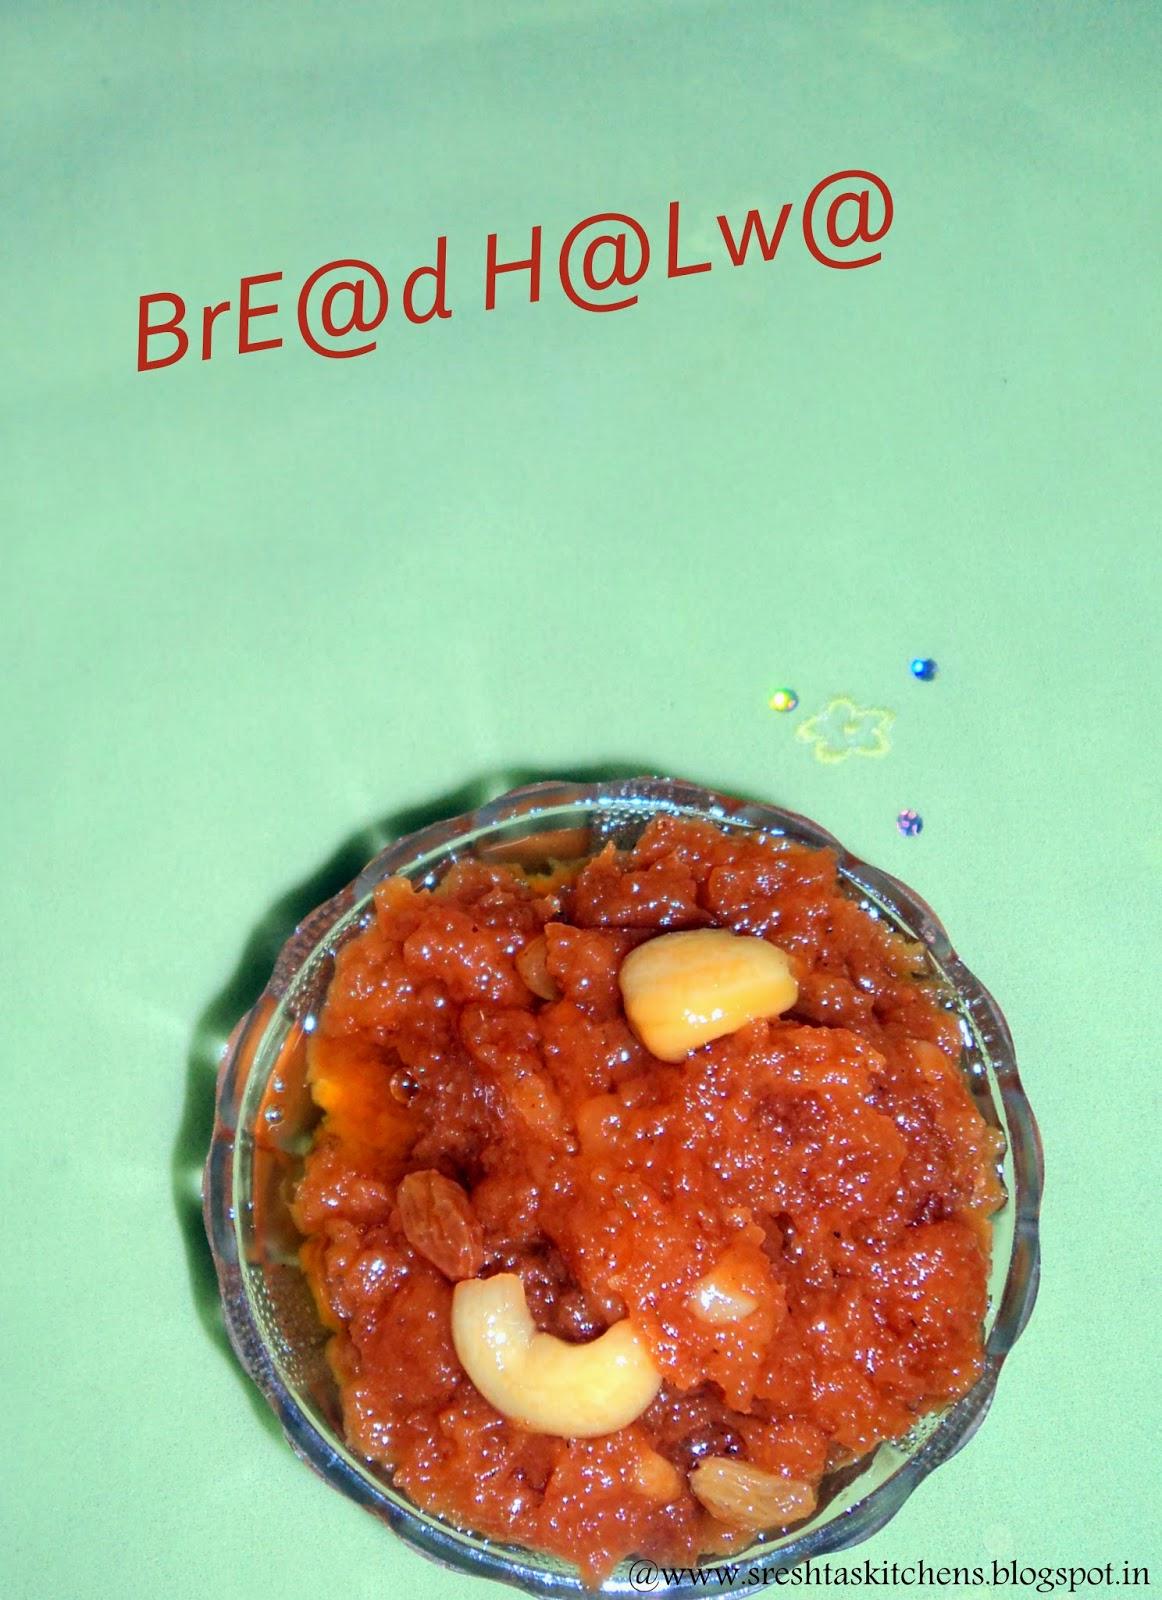 http://sreshtaskitchens.blogspot.in/2014/09/bread-halwa.html